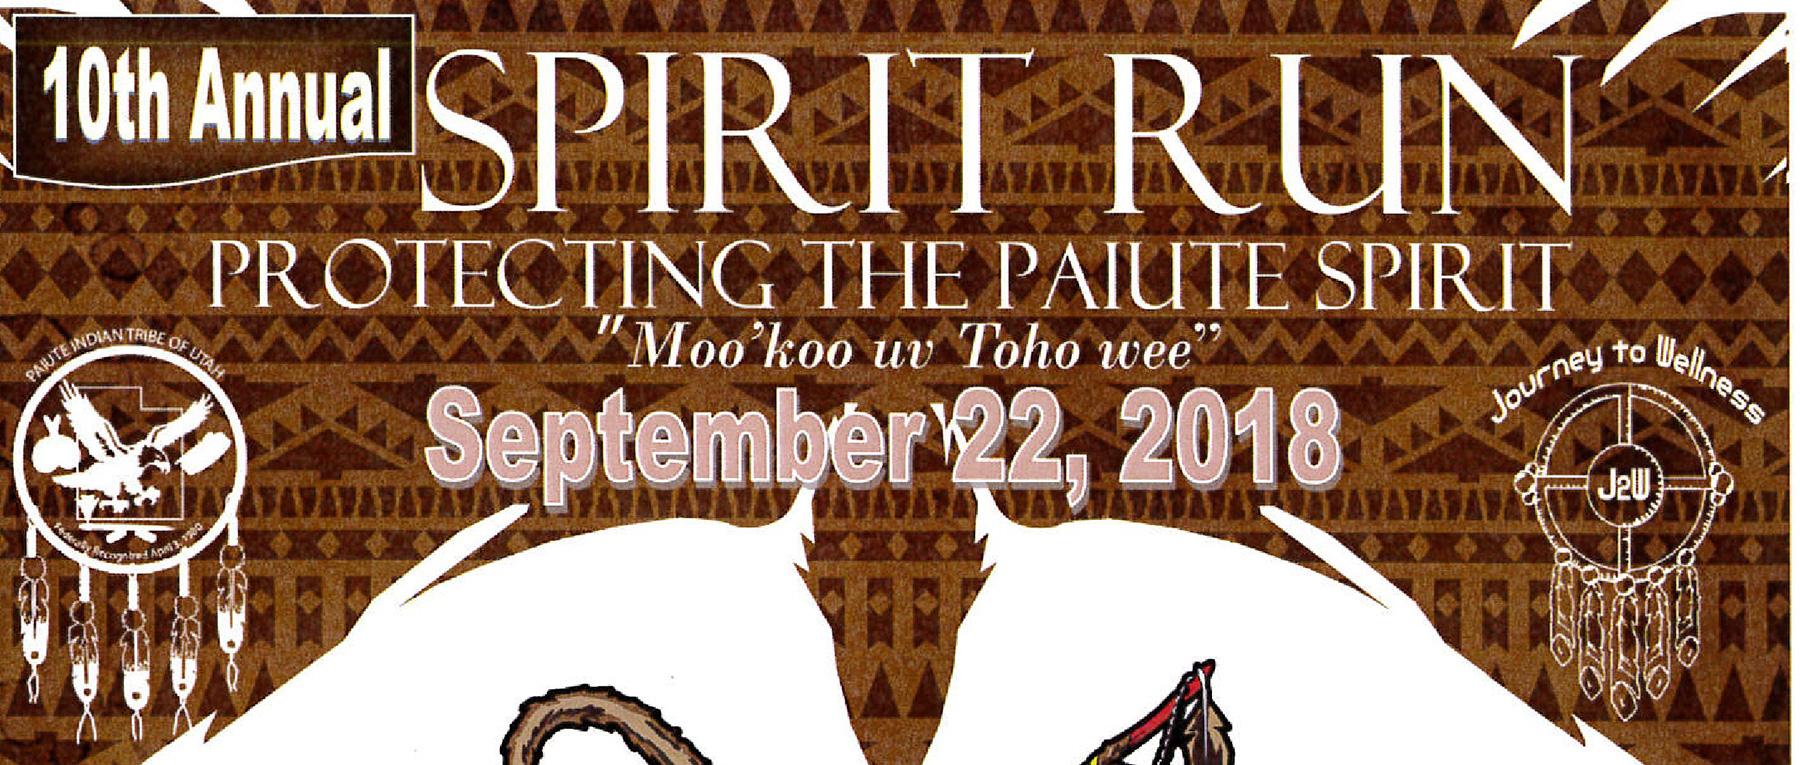 Paiute Spirit Run Sept. 22, 2018